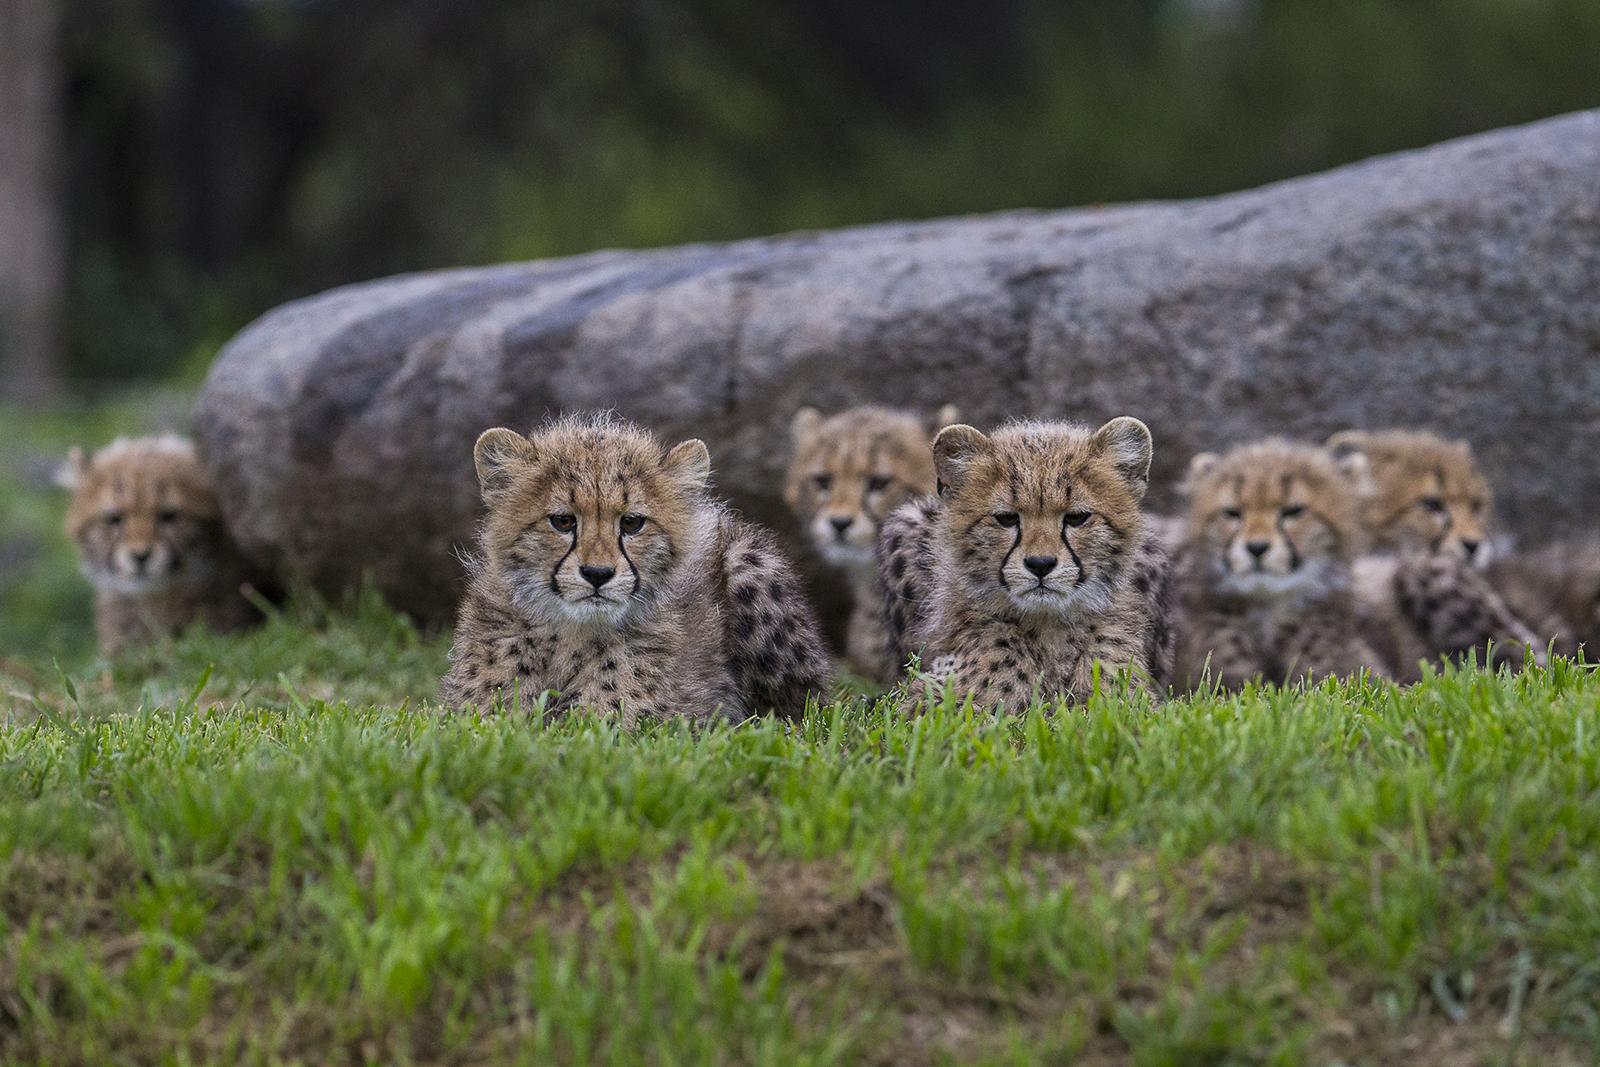 wallpaper : animals, nature, grass, wildlife, baby, big cats, zoo